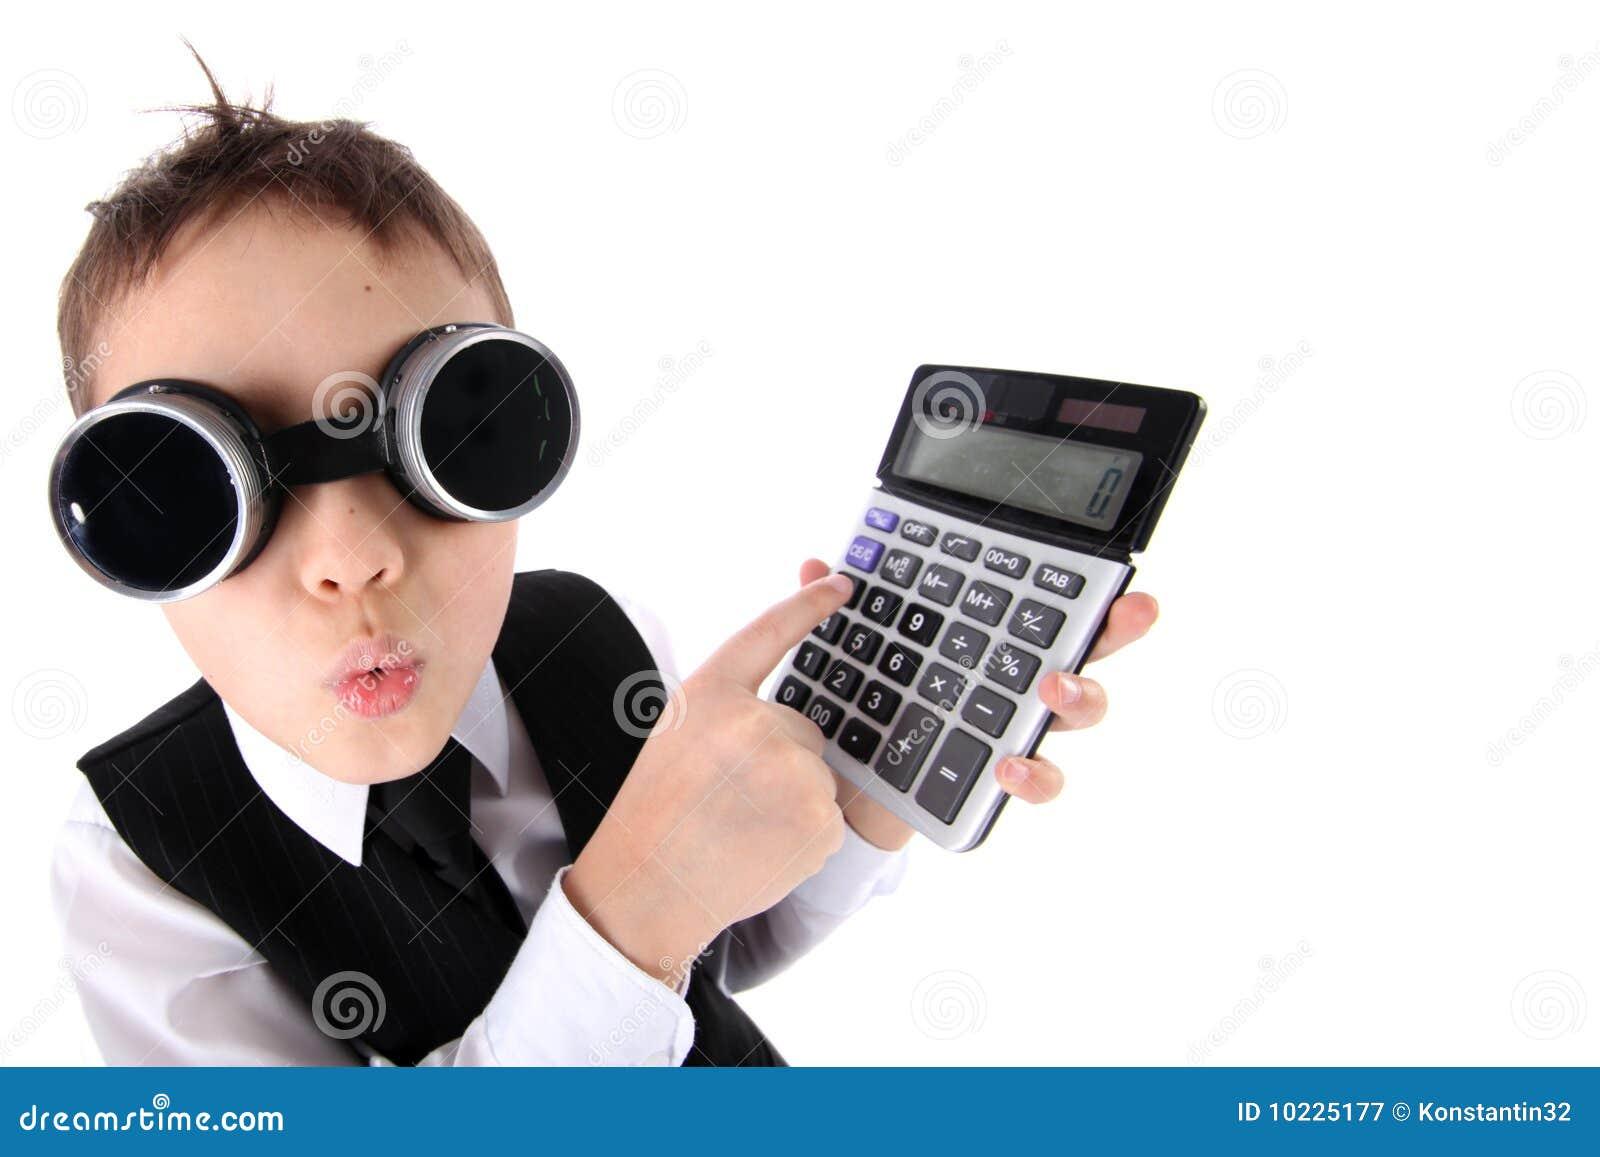 Boy with calculator